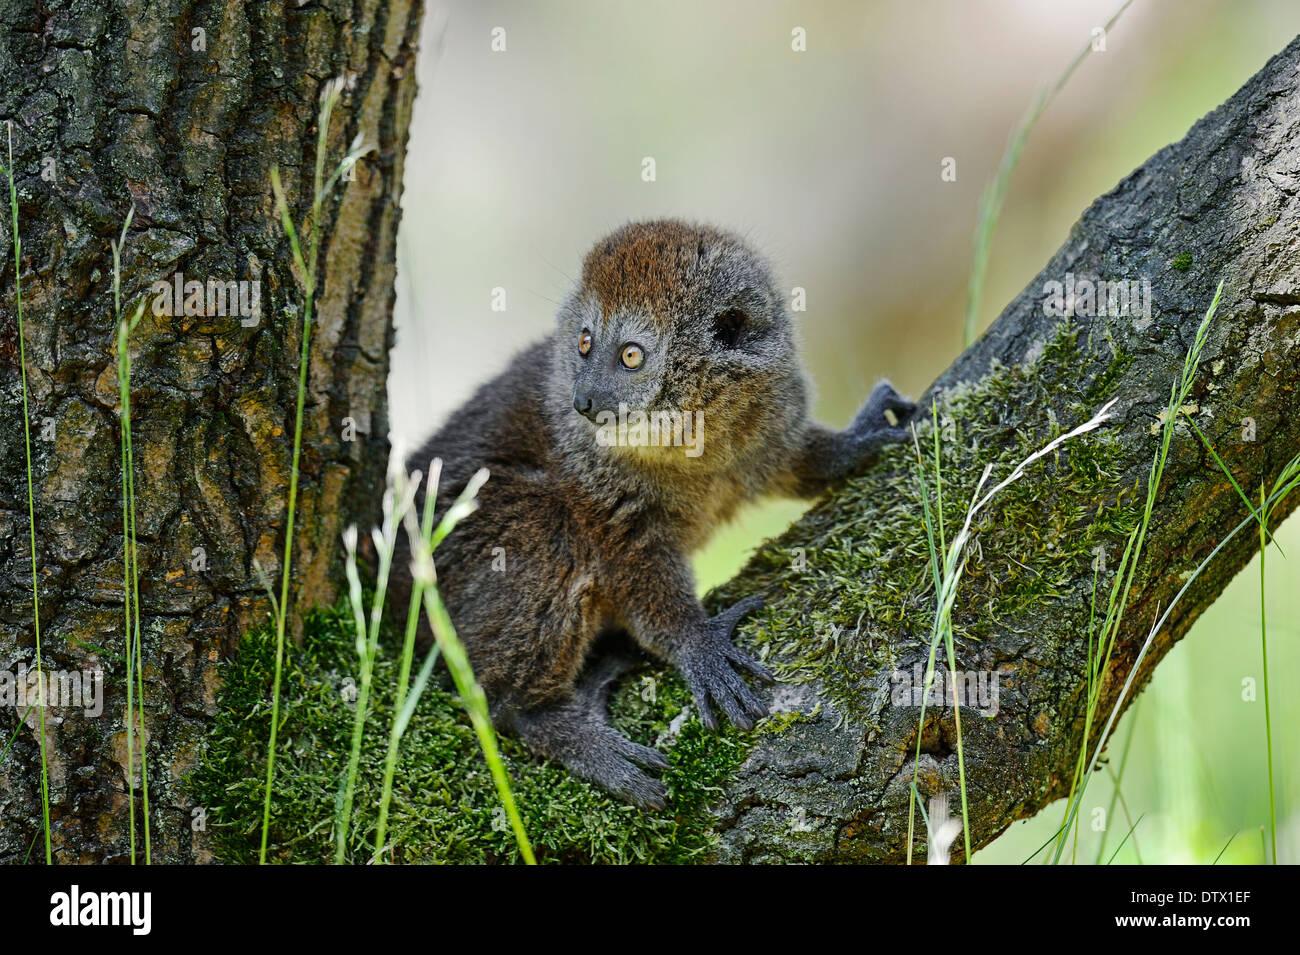 Alaotran Gentle Lemur - Stock Image